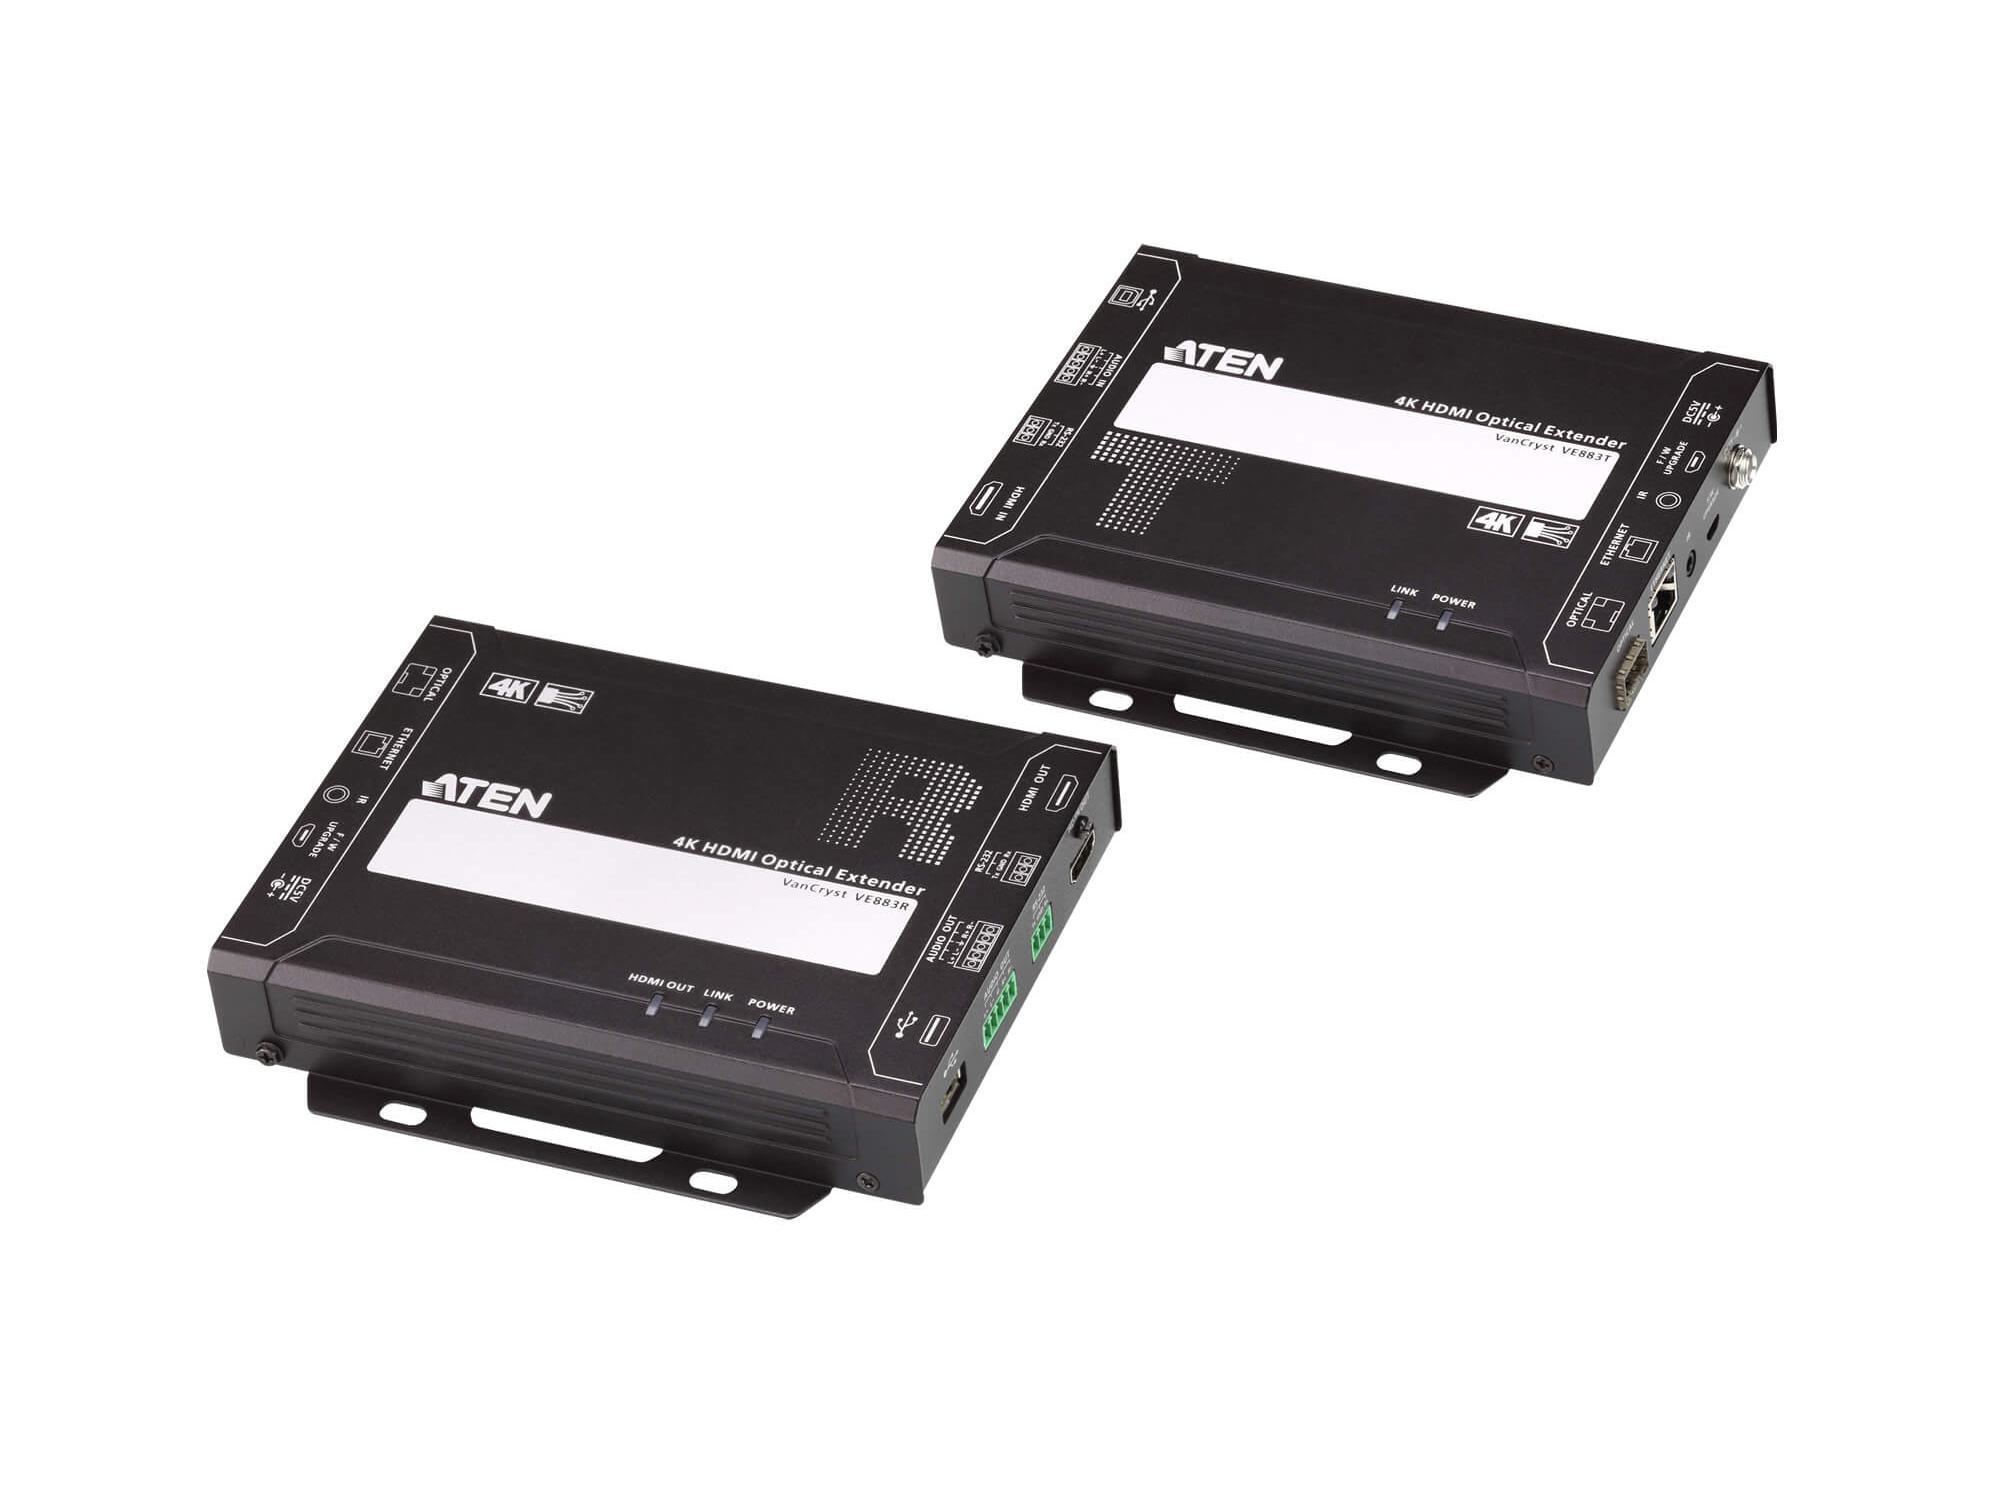 Aten VE883K2 4K HDMI Optical Extender (Transmitter/Receiver) Kit up to 10km over Duplex Fiber Optic Cable